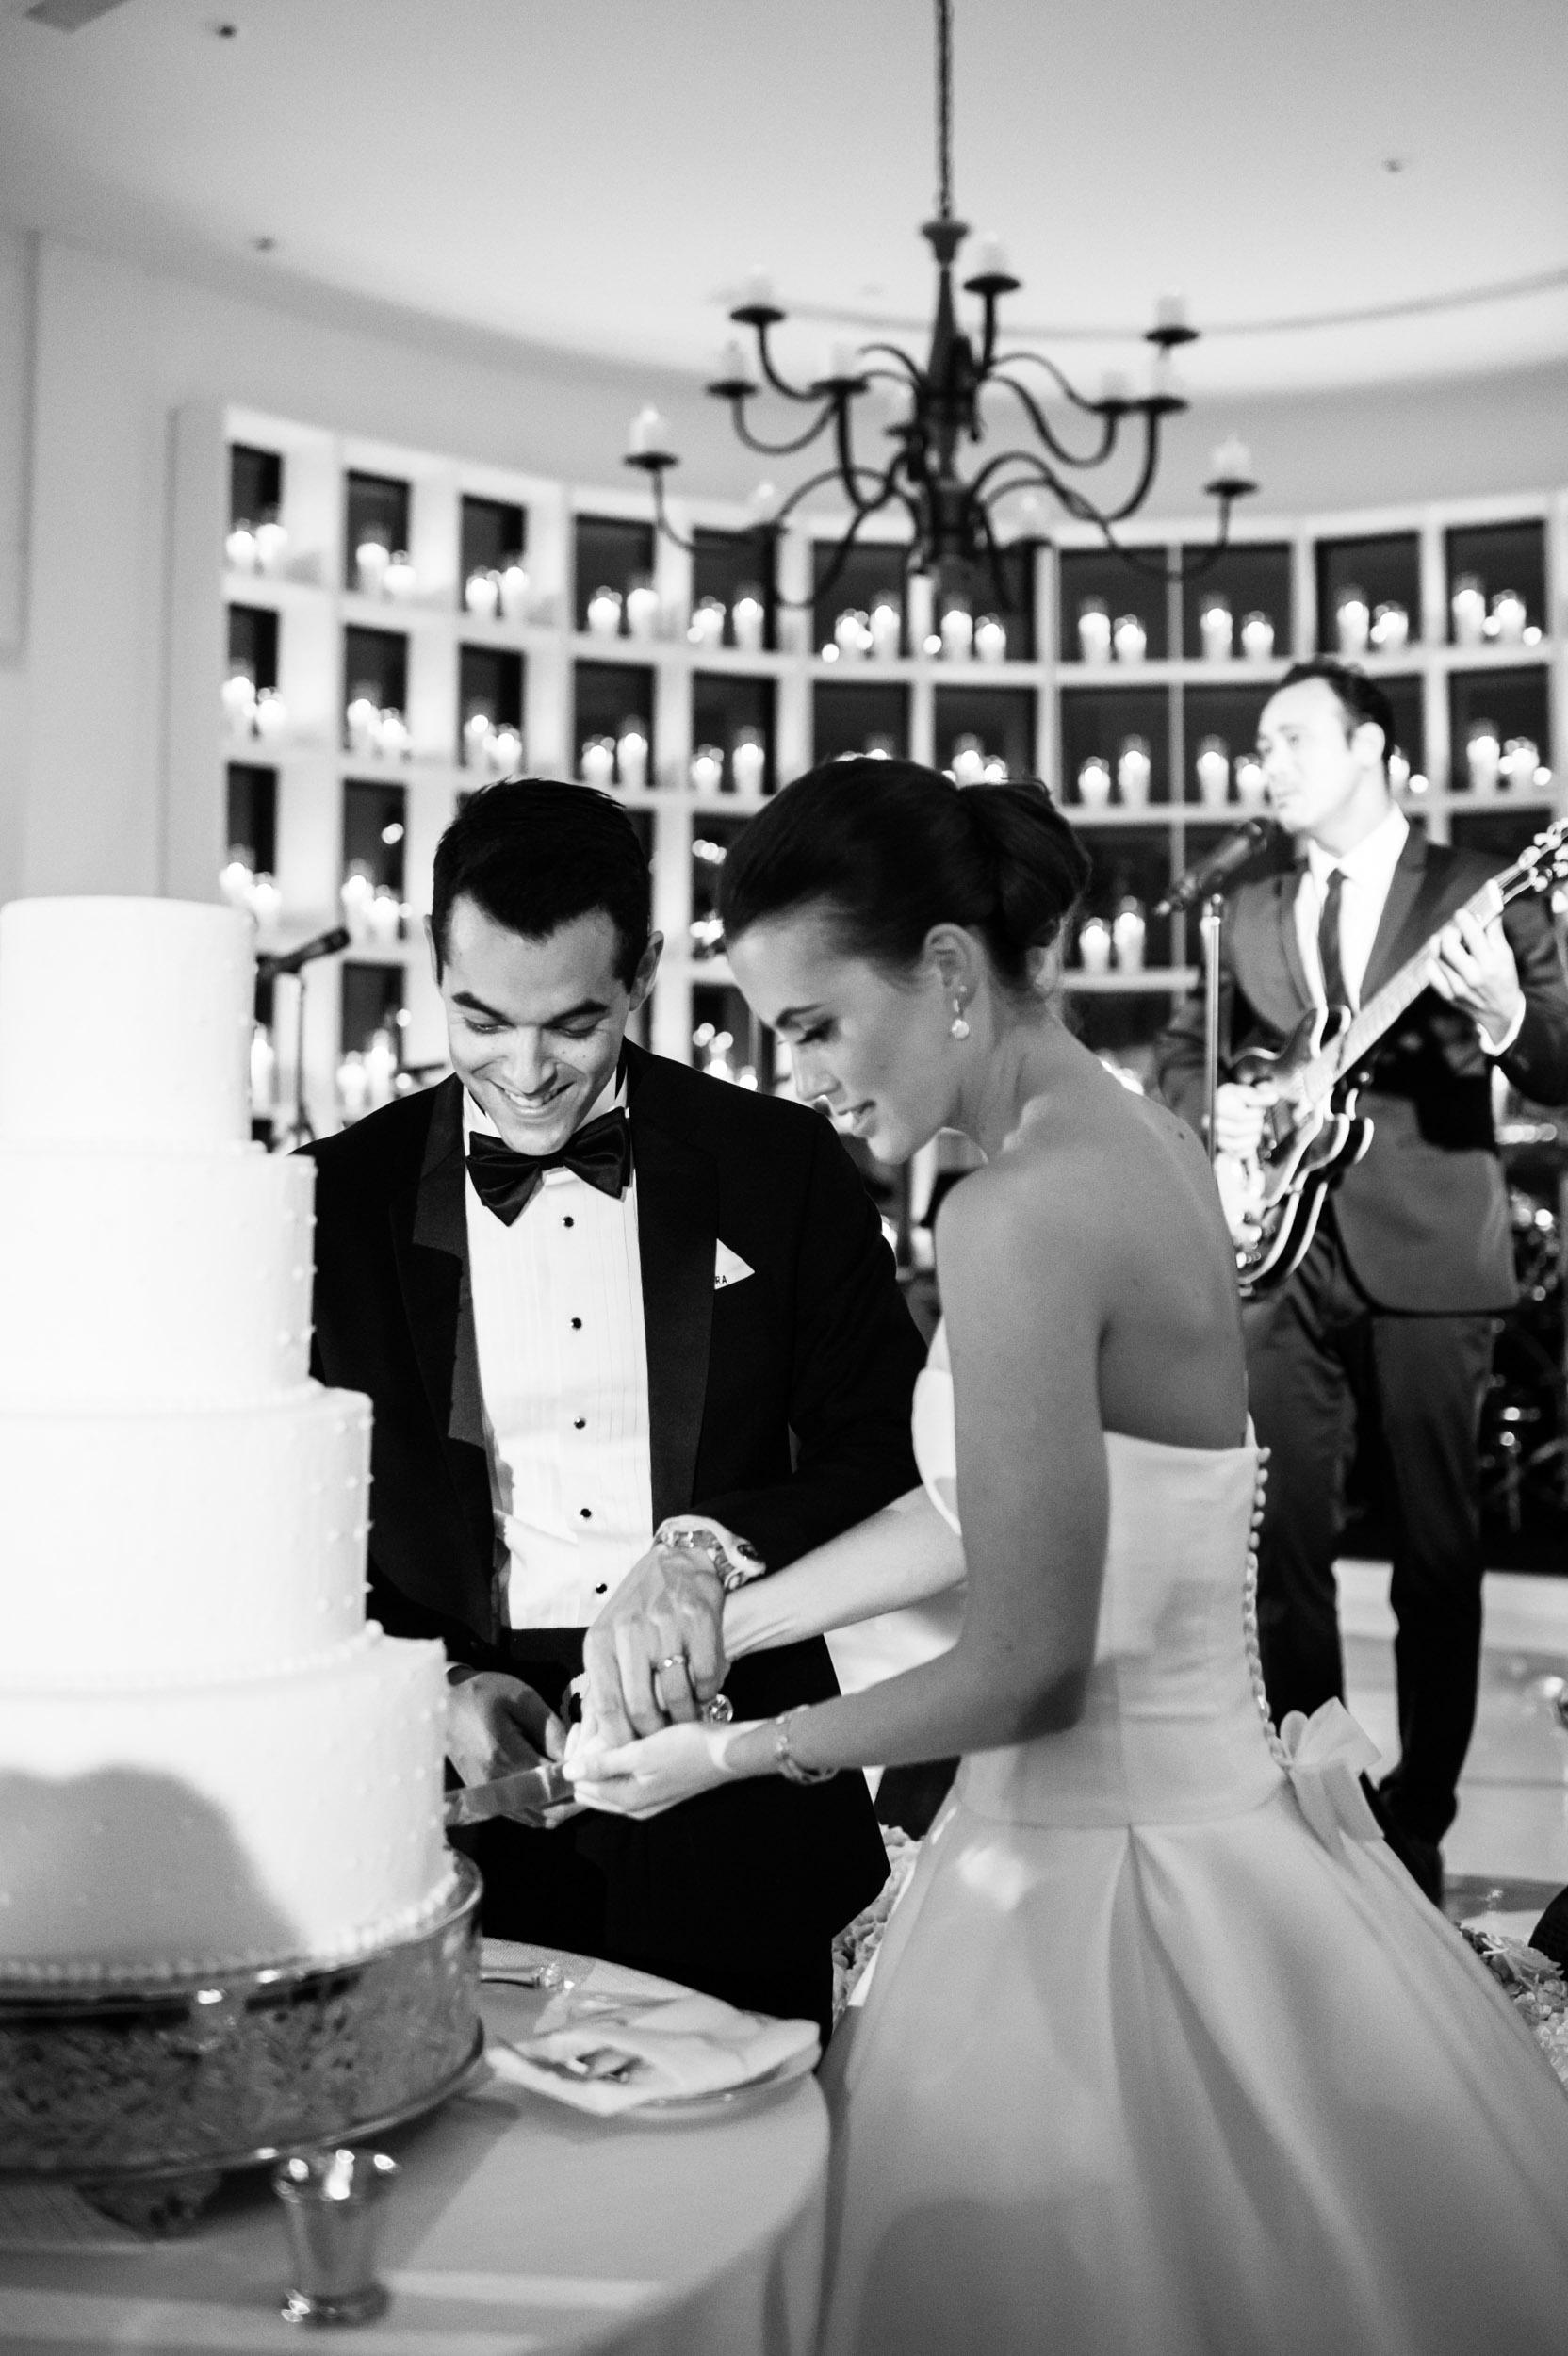 Bride and groom cut the cake at their wedding reception in Kiawah Island, South Carolina.